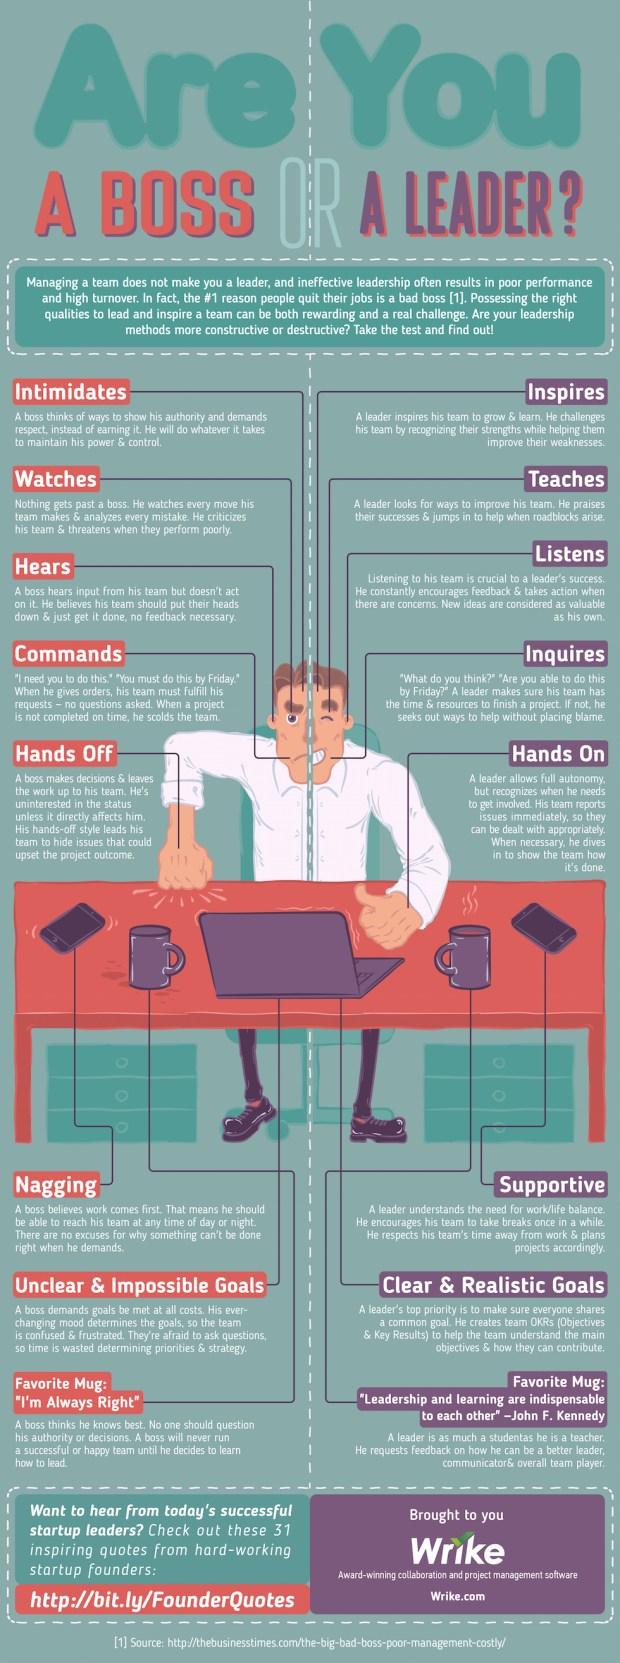 Boss vs. Leader: The Never-Ending Battle Between Power and Leadership (#Infographic)